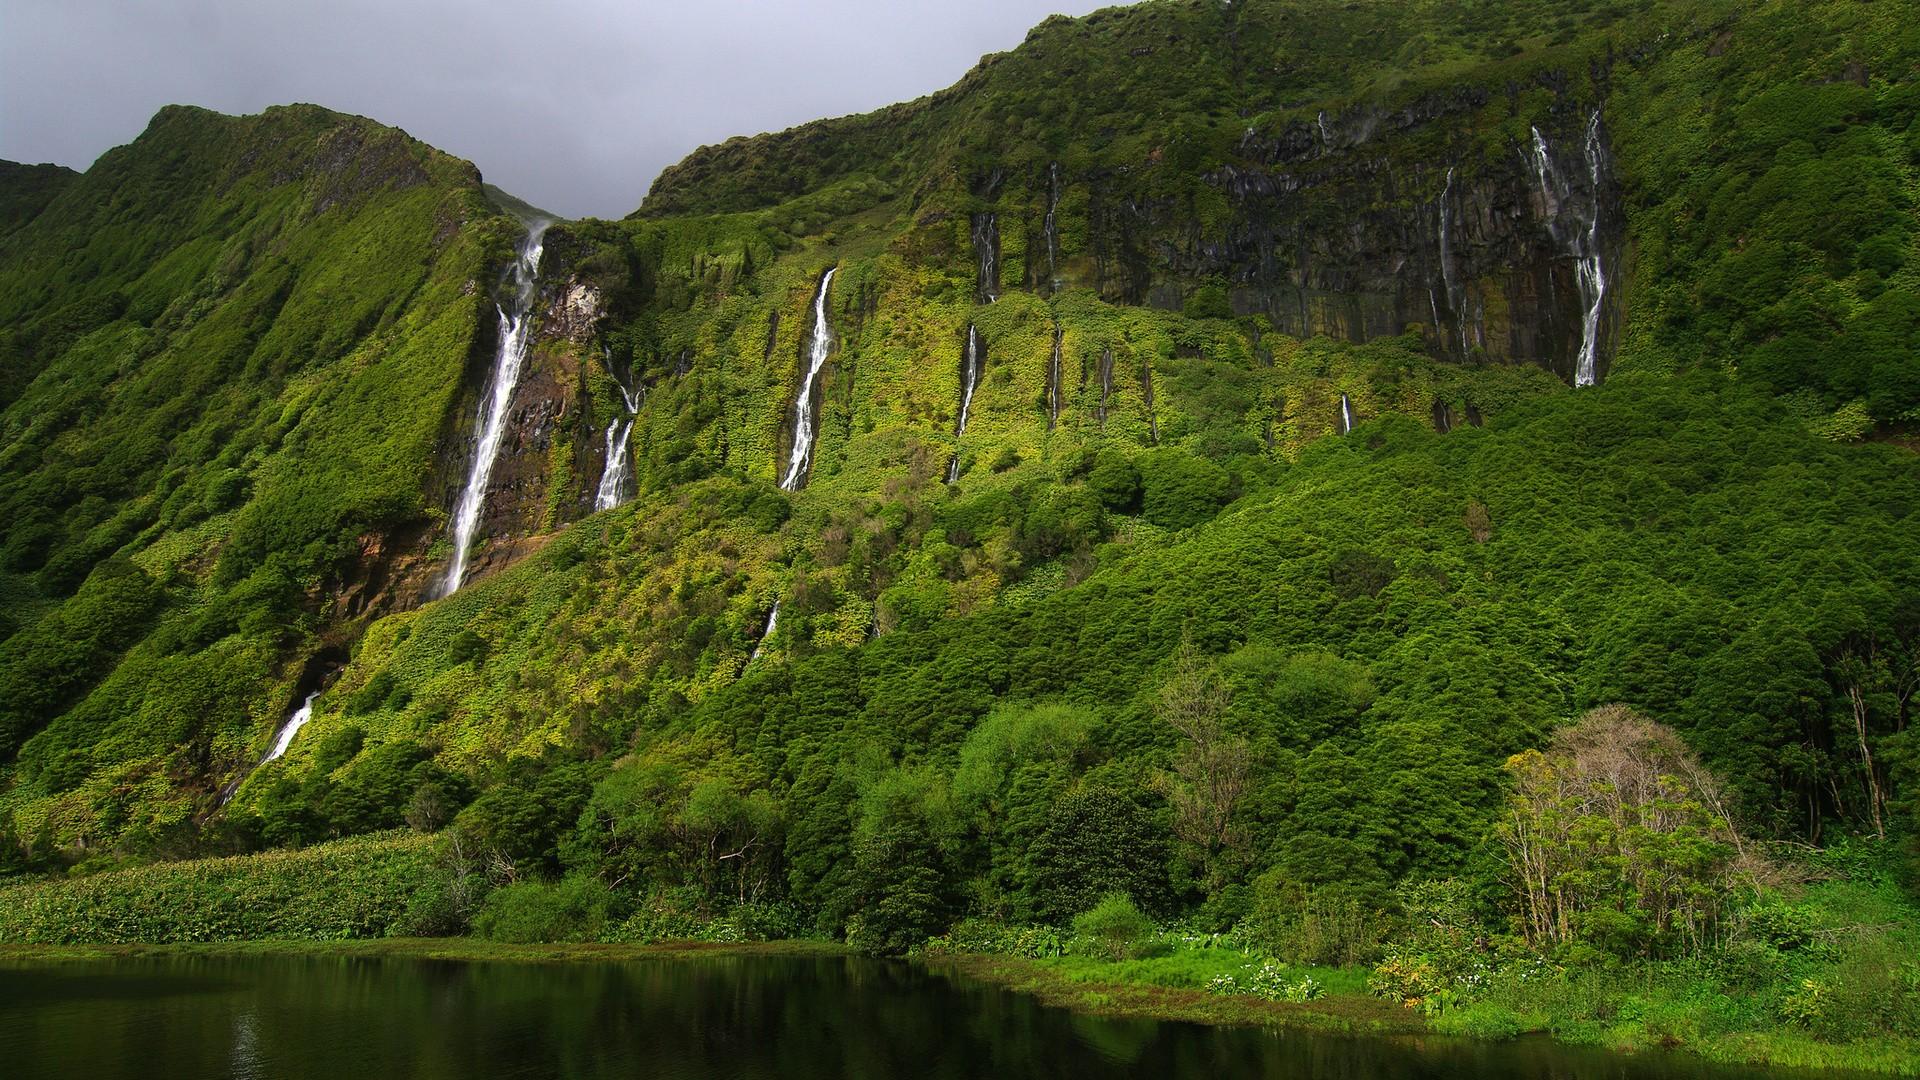 mountain and the greenary - photo #11